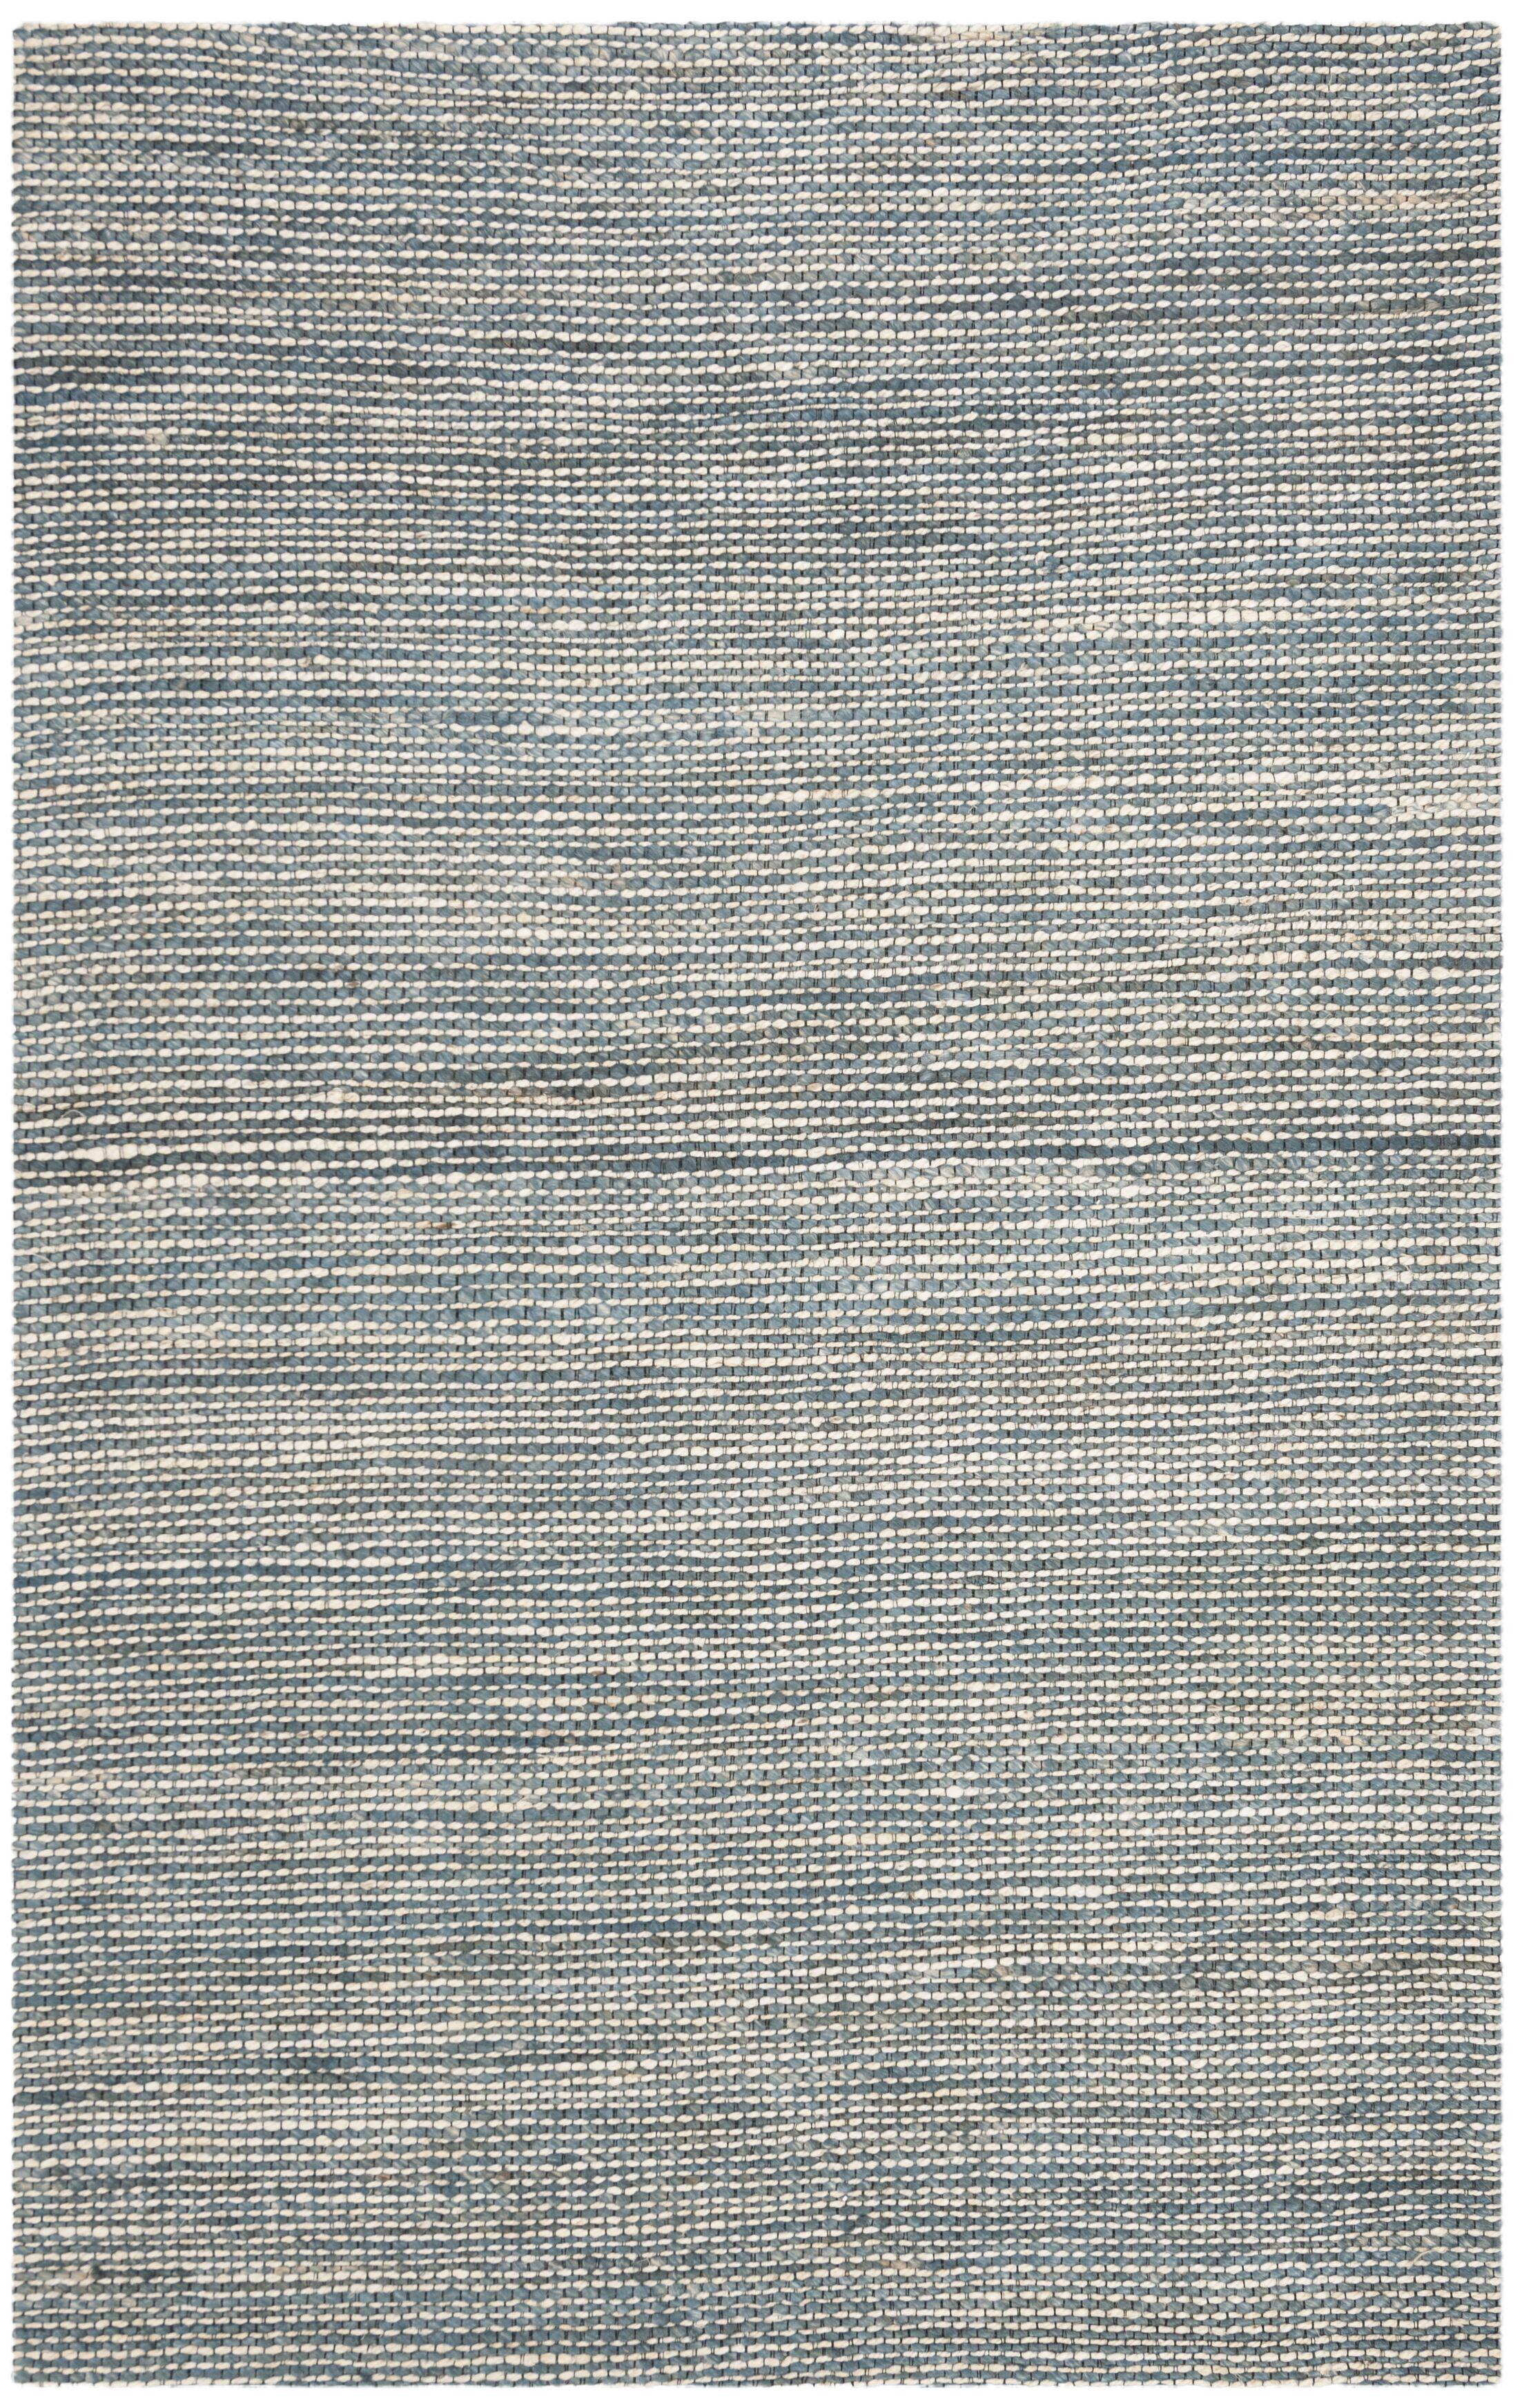 Burner Hand-Woven Blue/Ivory Area Rug Rug Size: Rectangle 4' x 6'